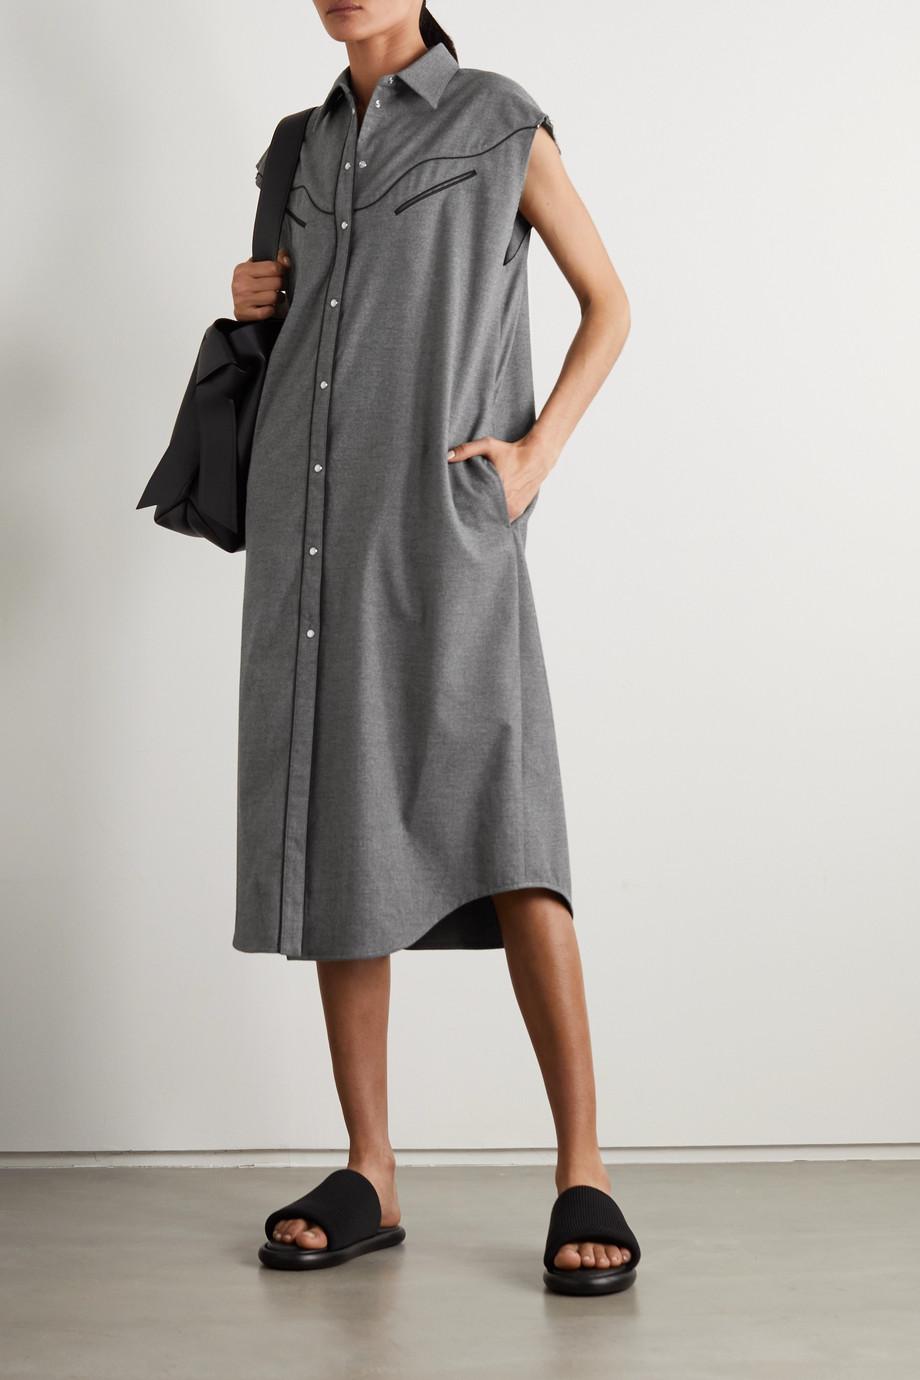 MM6 Maison Margiela Midi-Hemdblusenkleid aus Flanell mit Paspeln